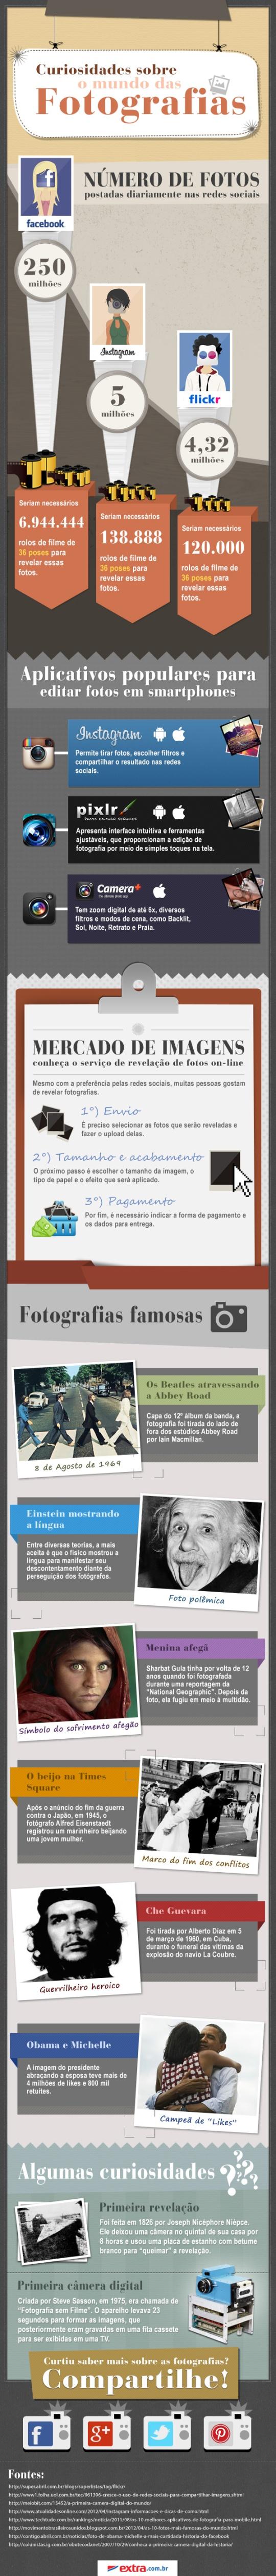 priscila_vitalino_curiosidades-fotografias_temnafotografia